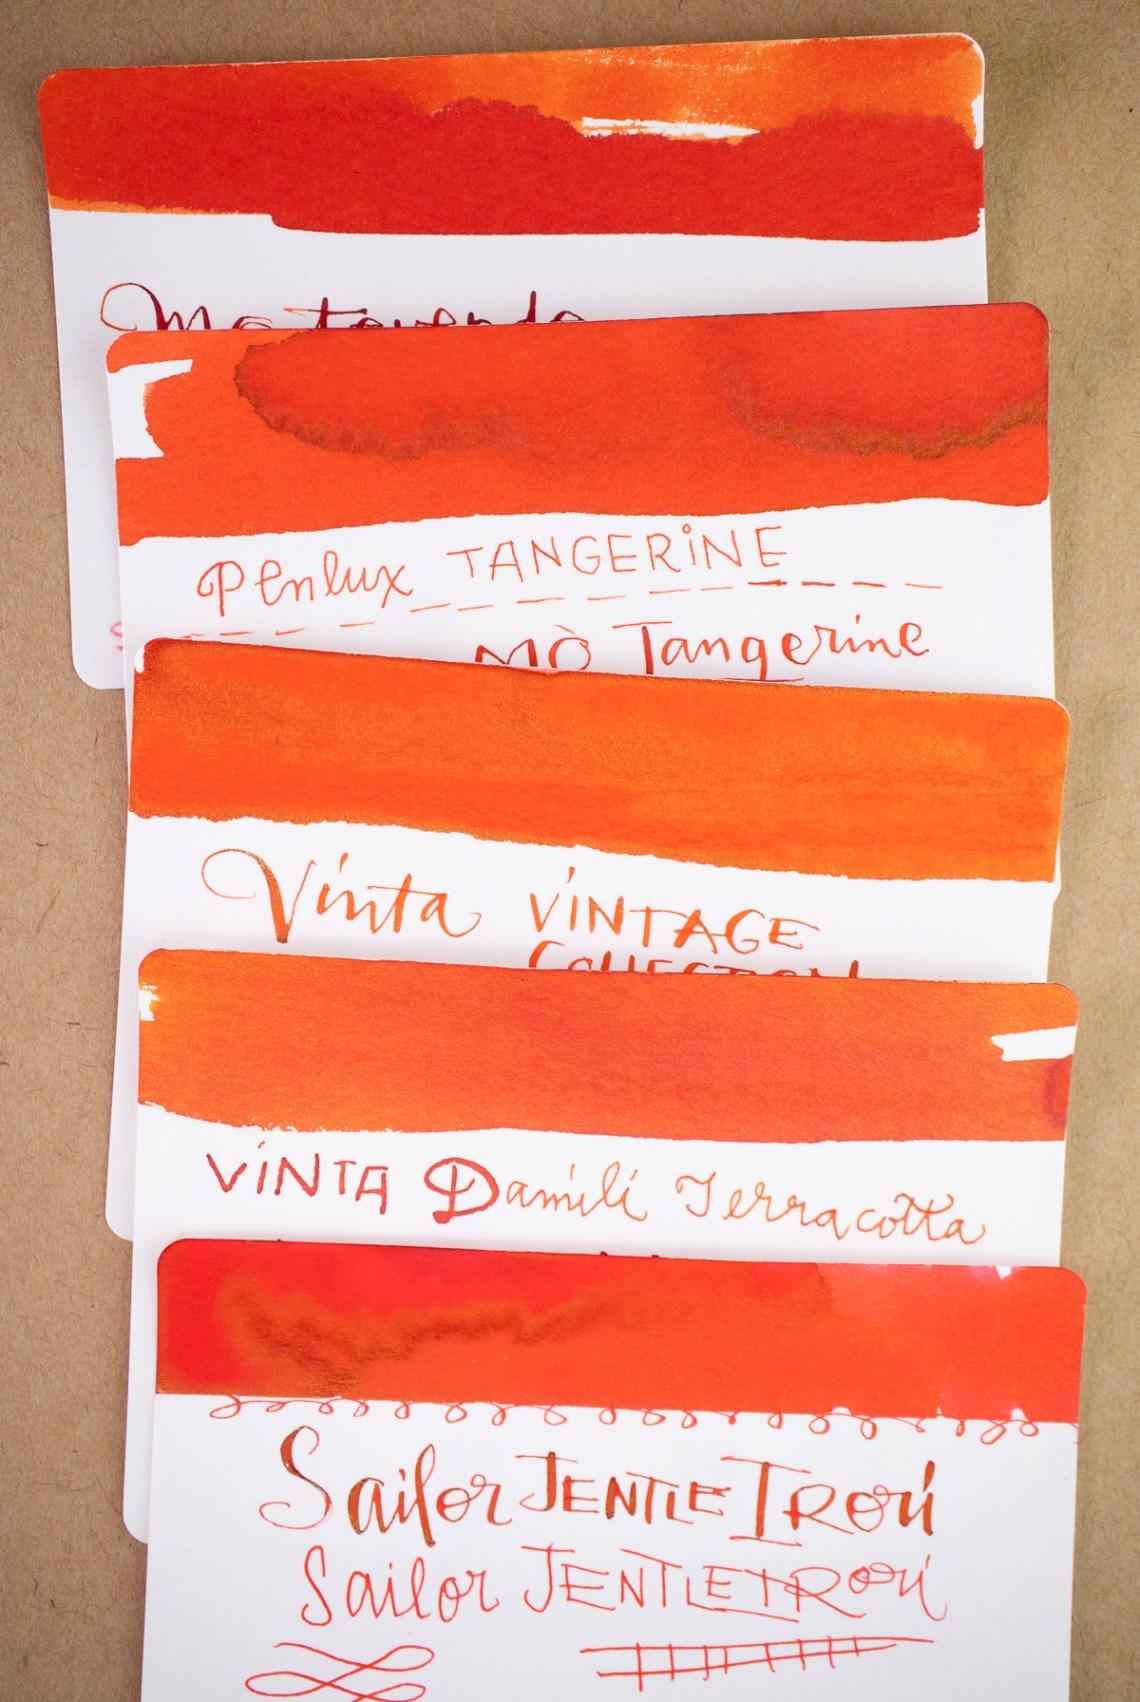 Vinta Vintage Collection ink comparison